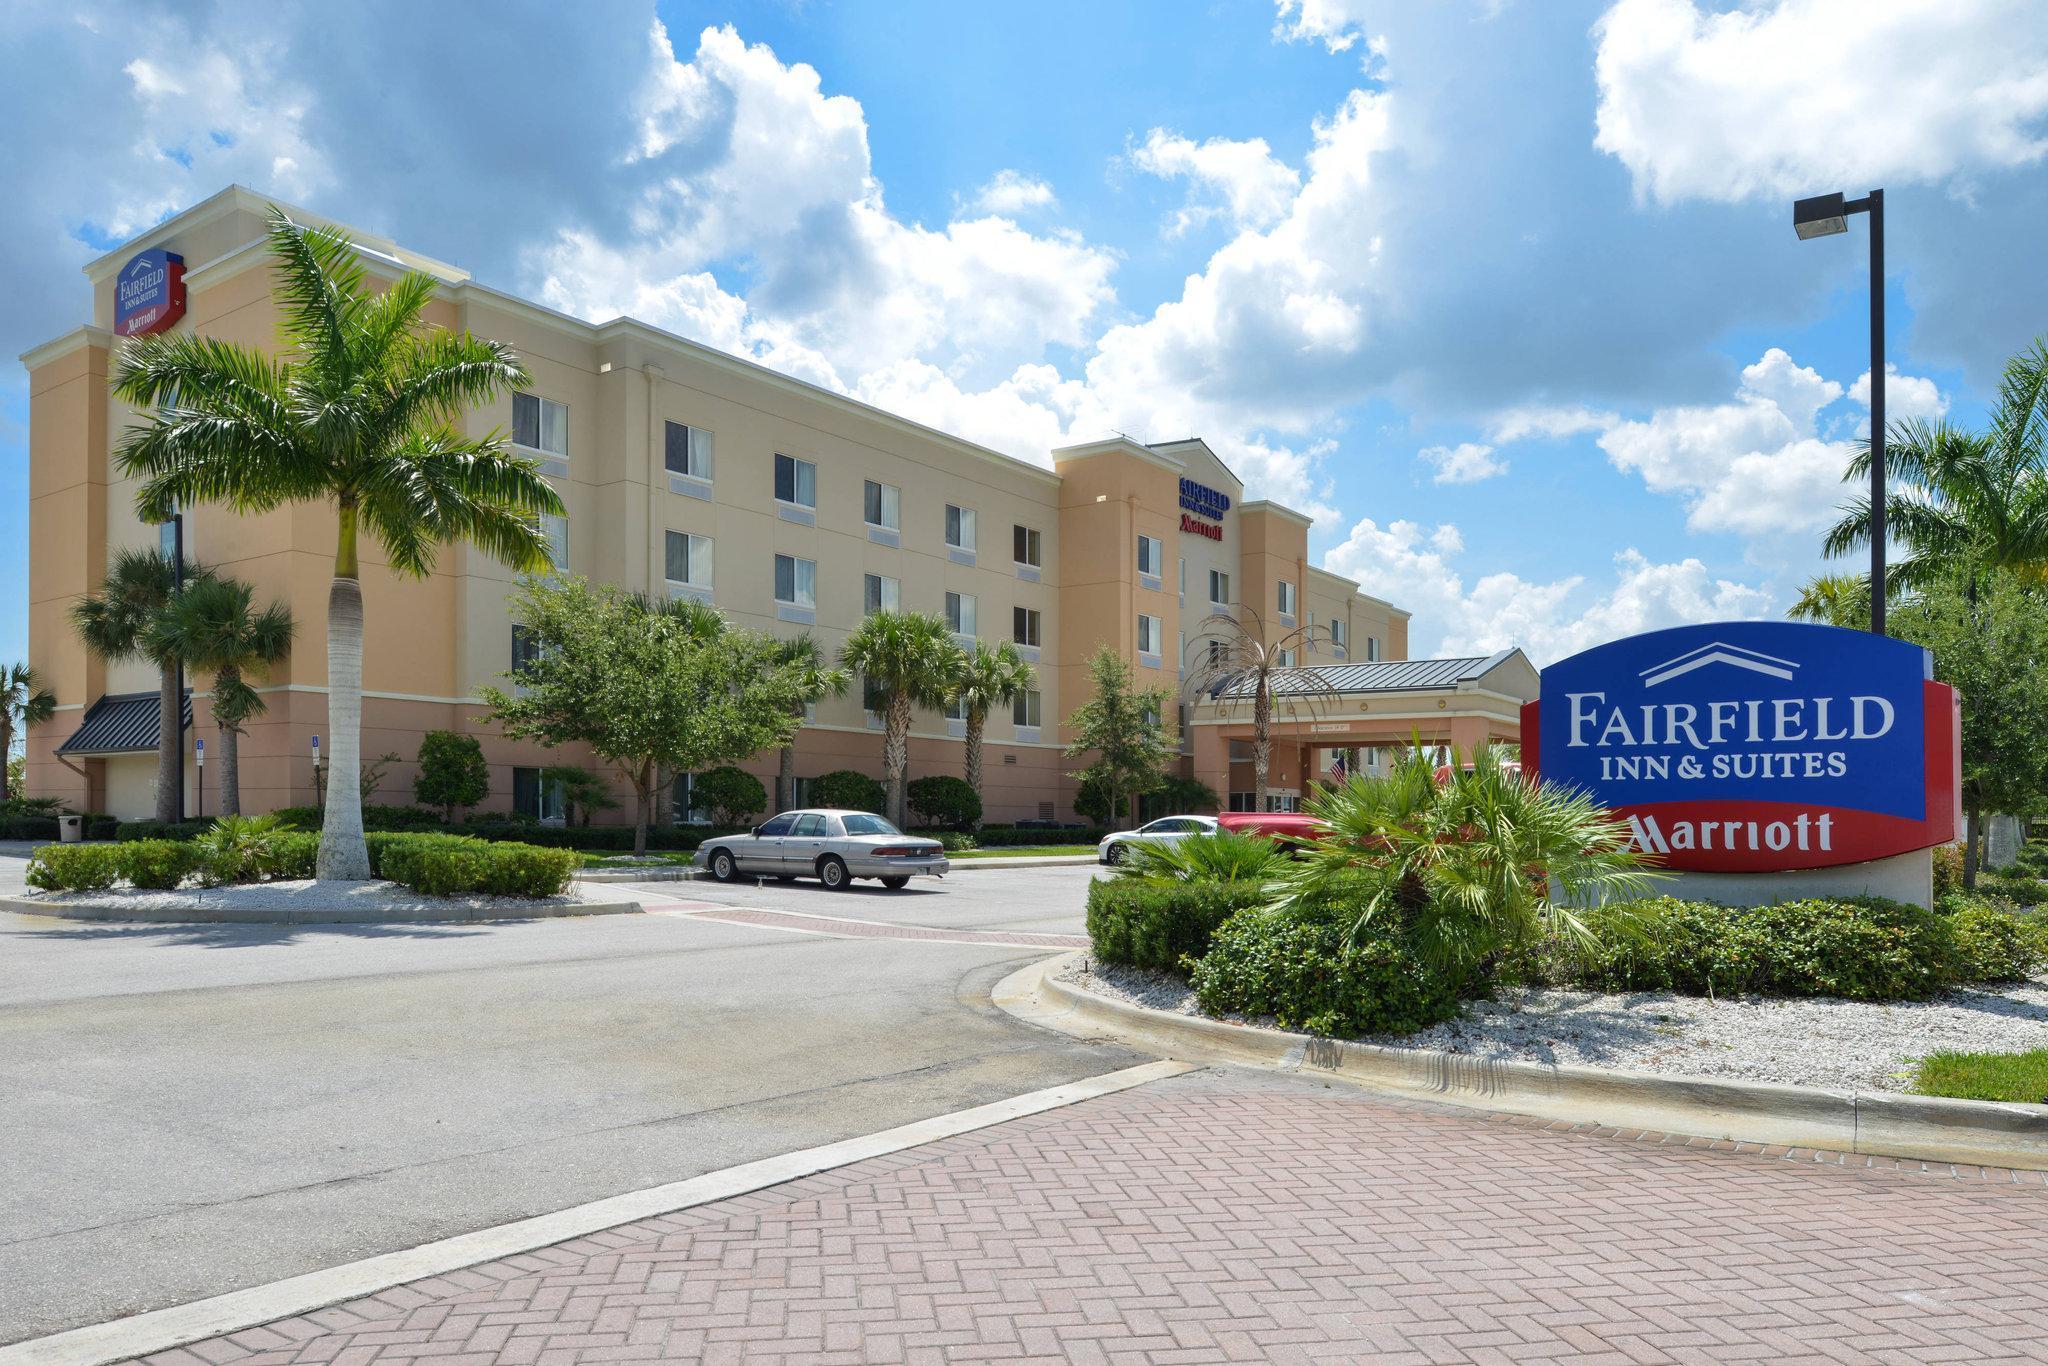 Fairfield Inn And Suites Fort Pierce